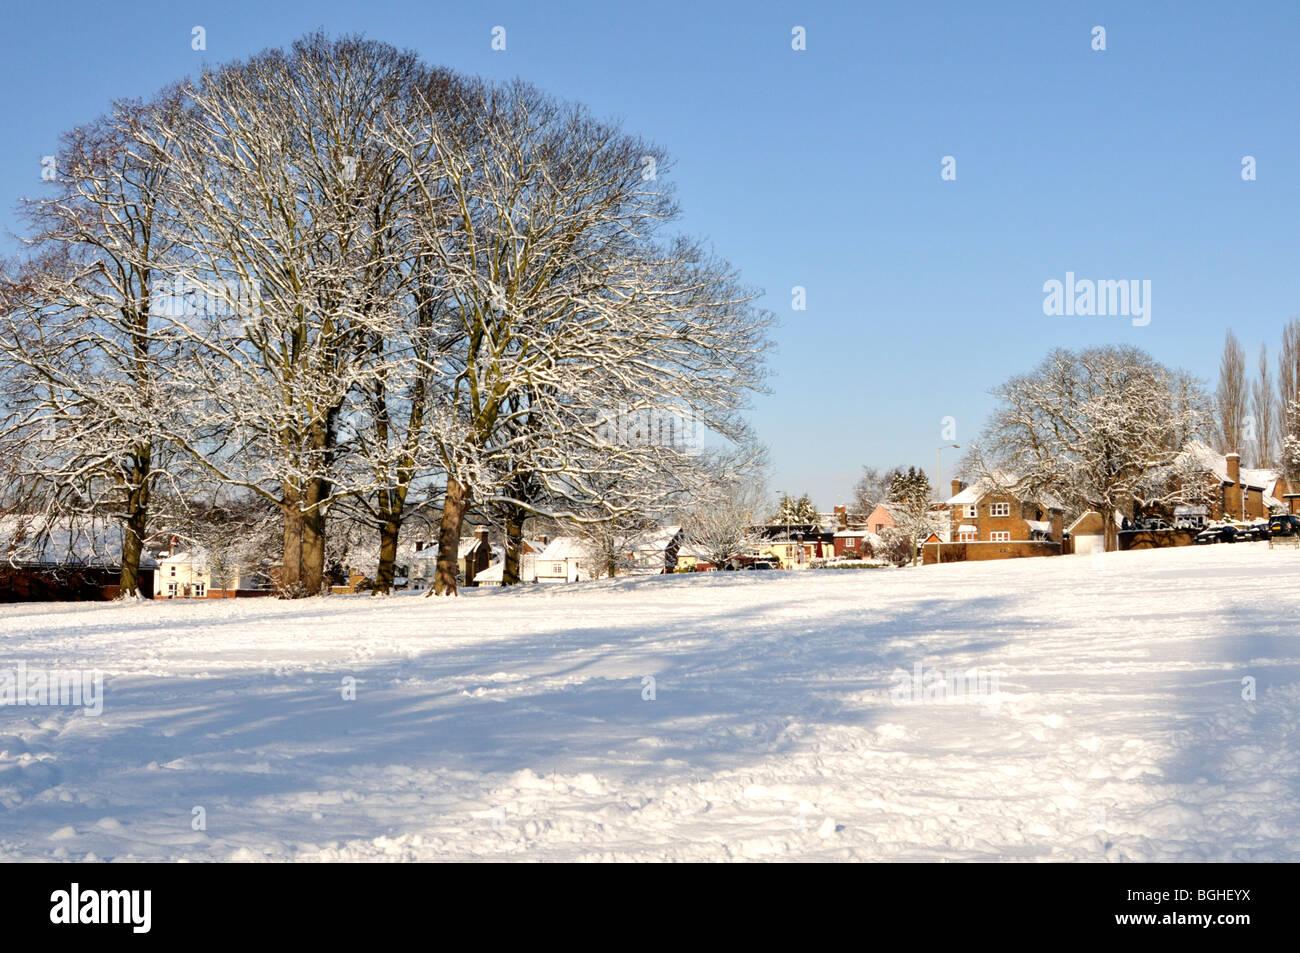 2010 Hertfordshire winter snow scene, UK. - Stock Image